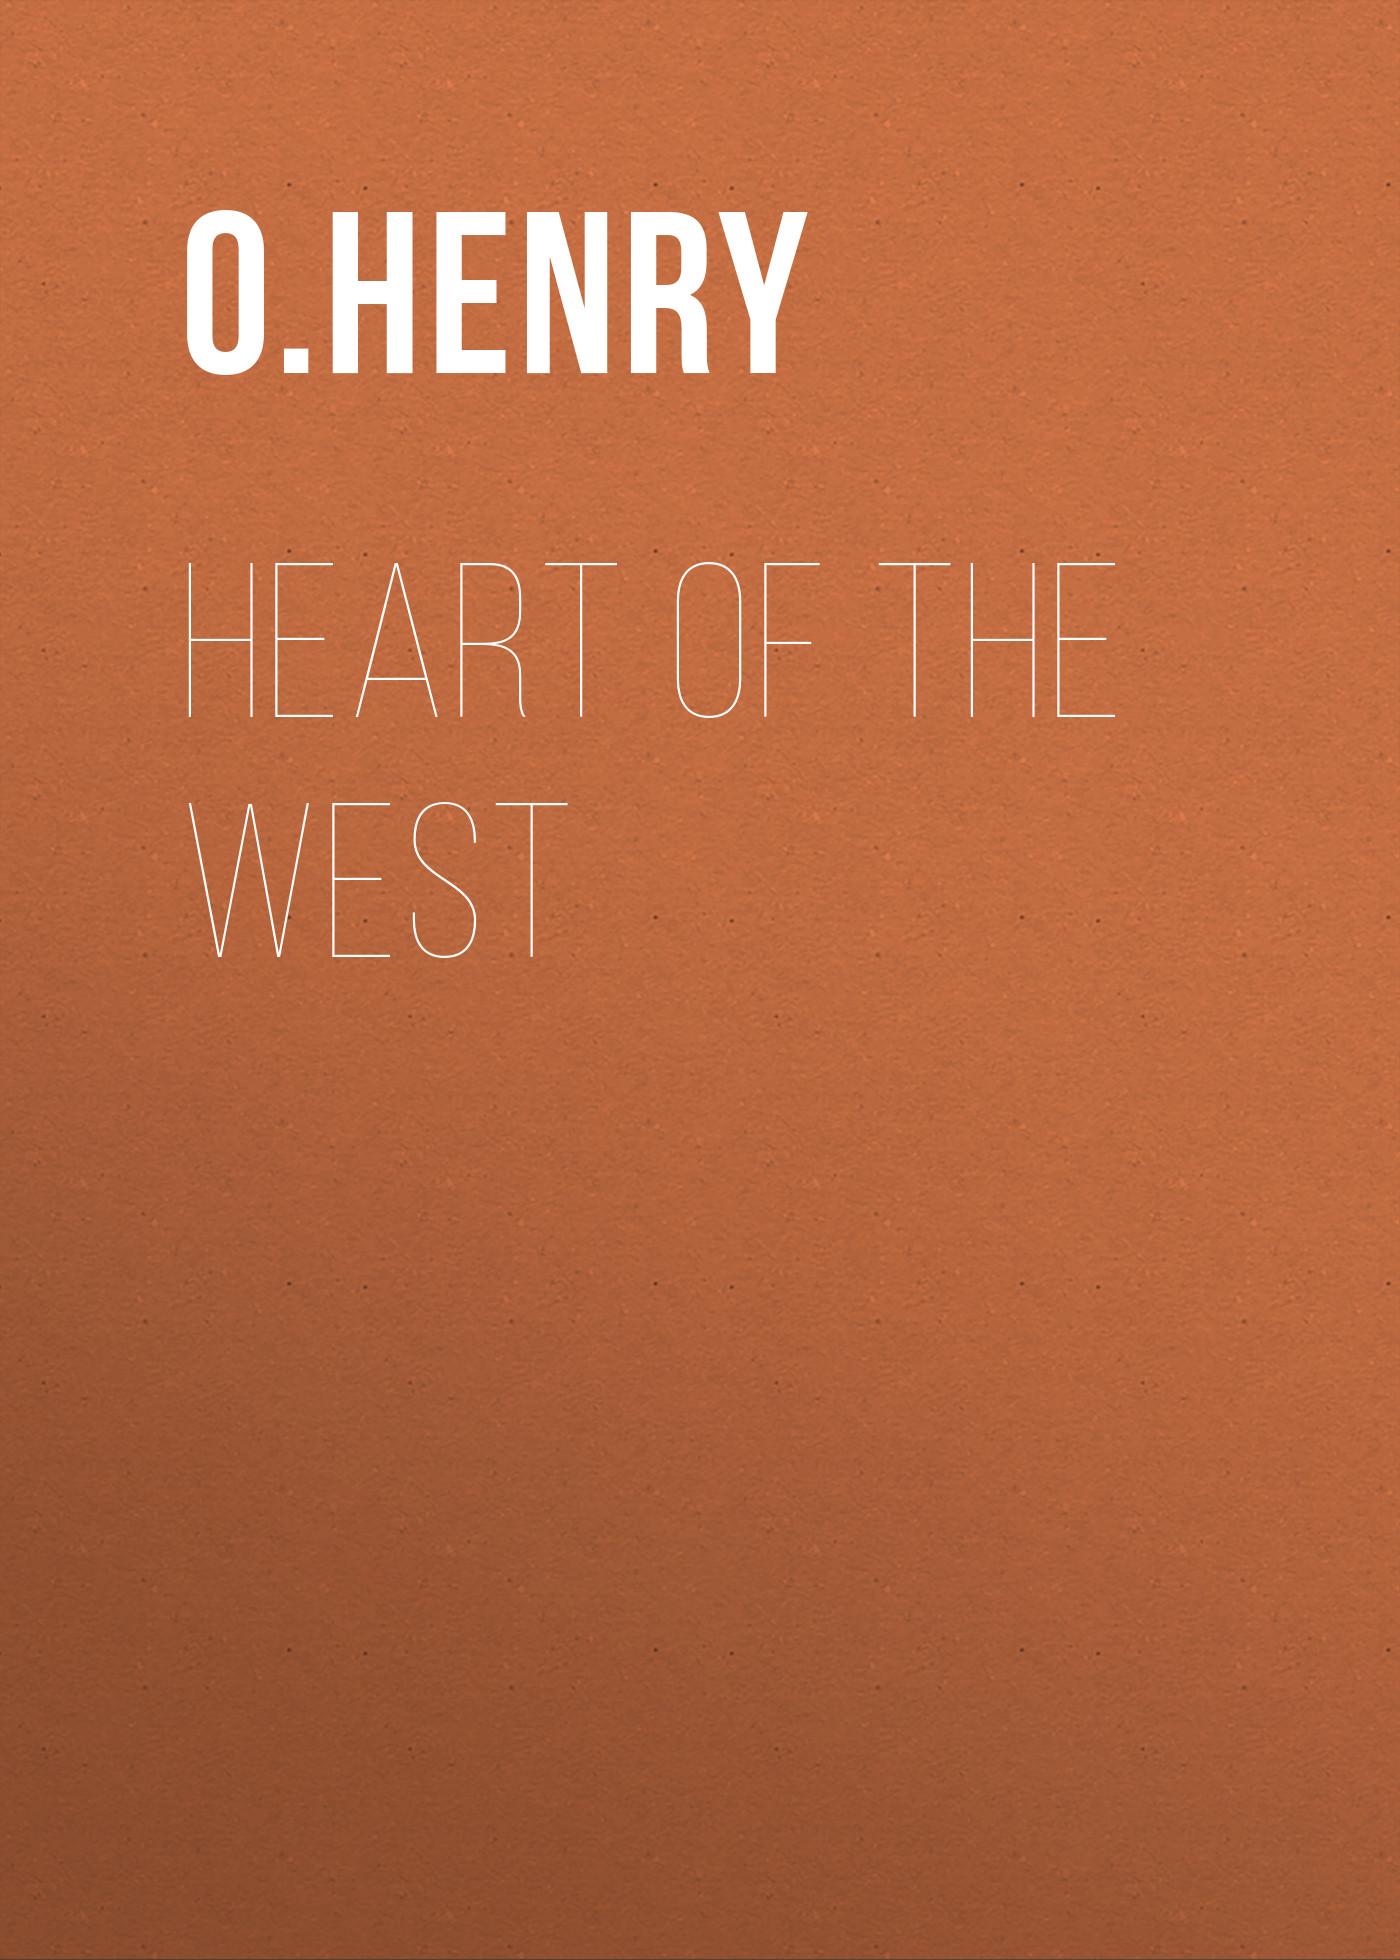 О. Генри Heart of the West цена